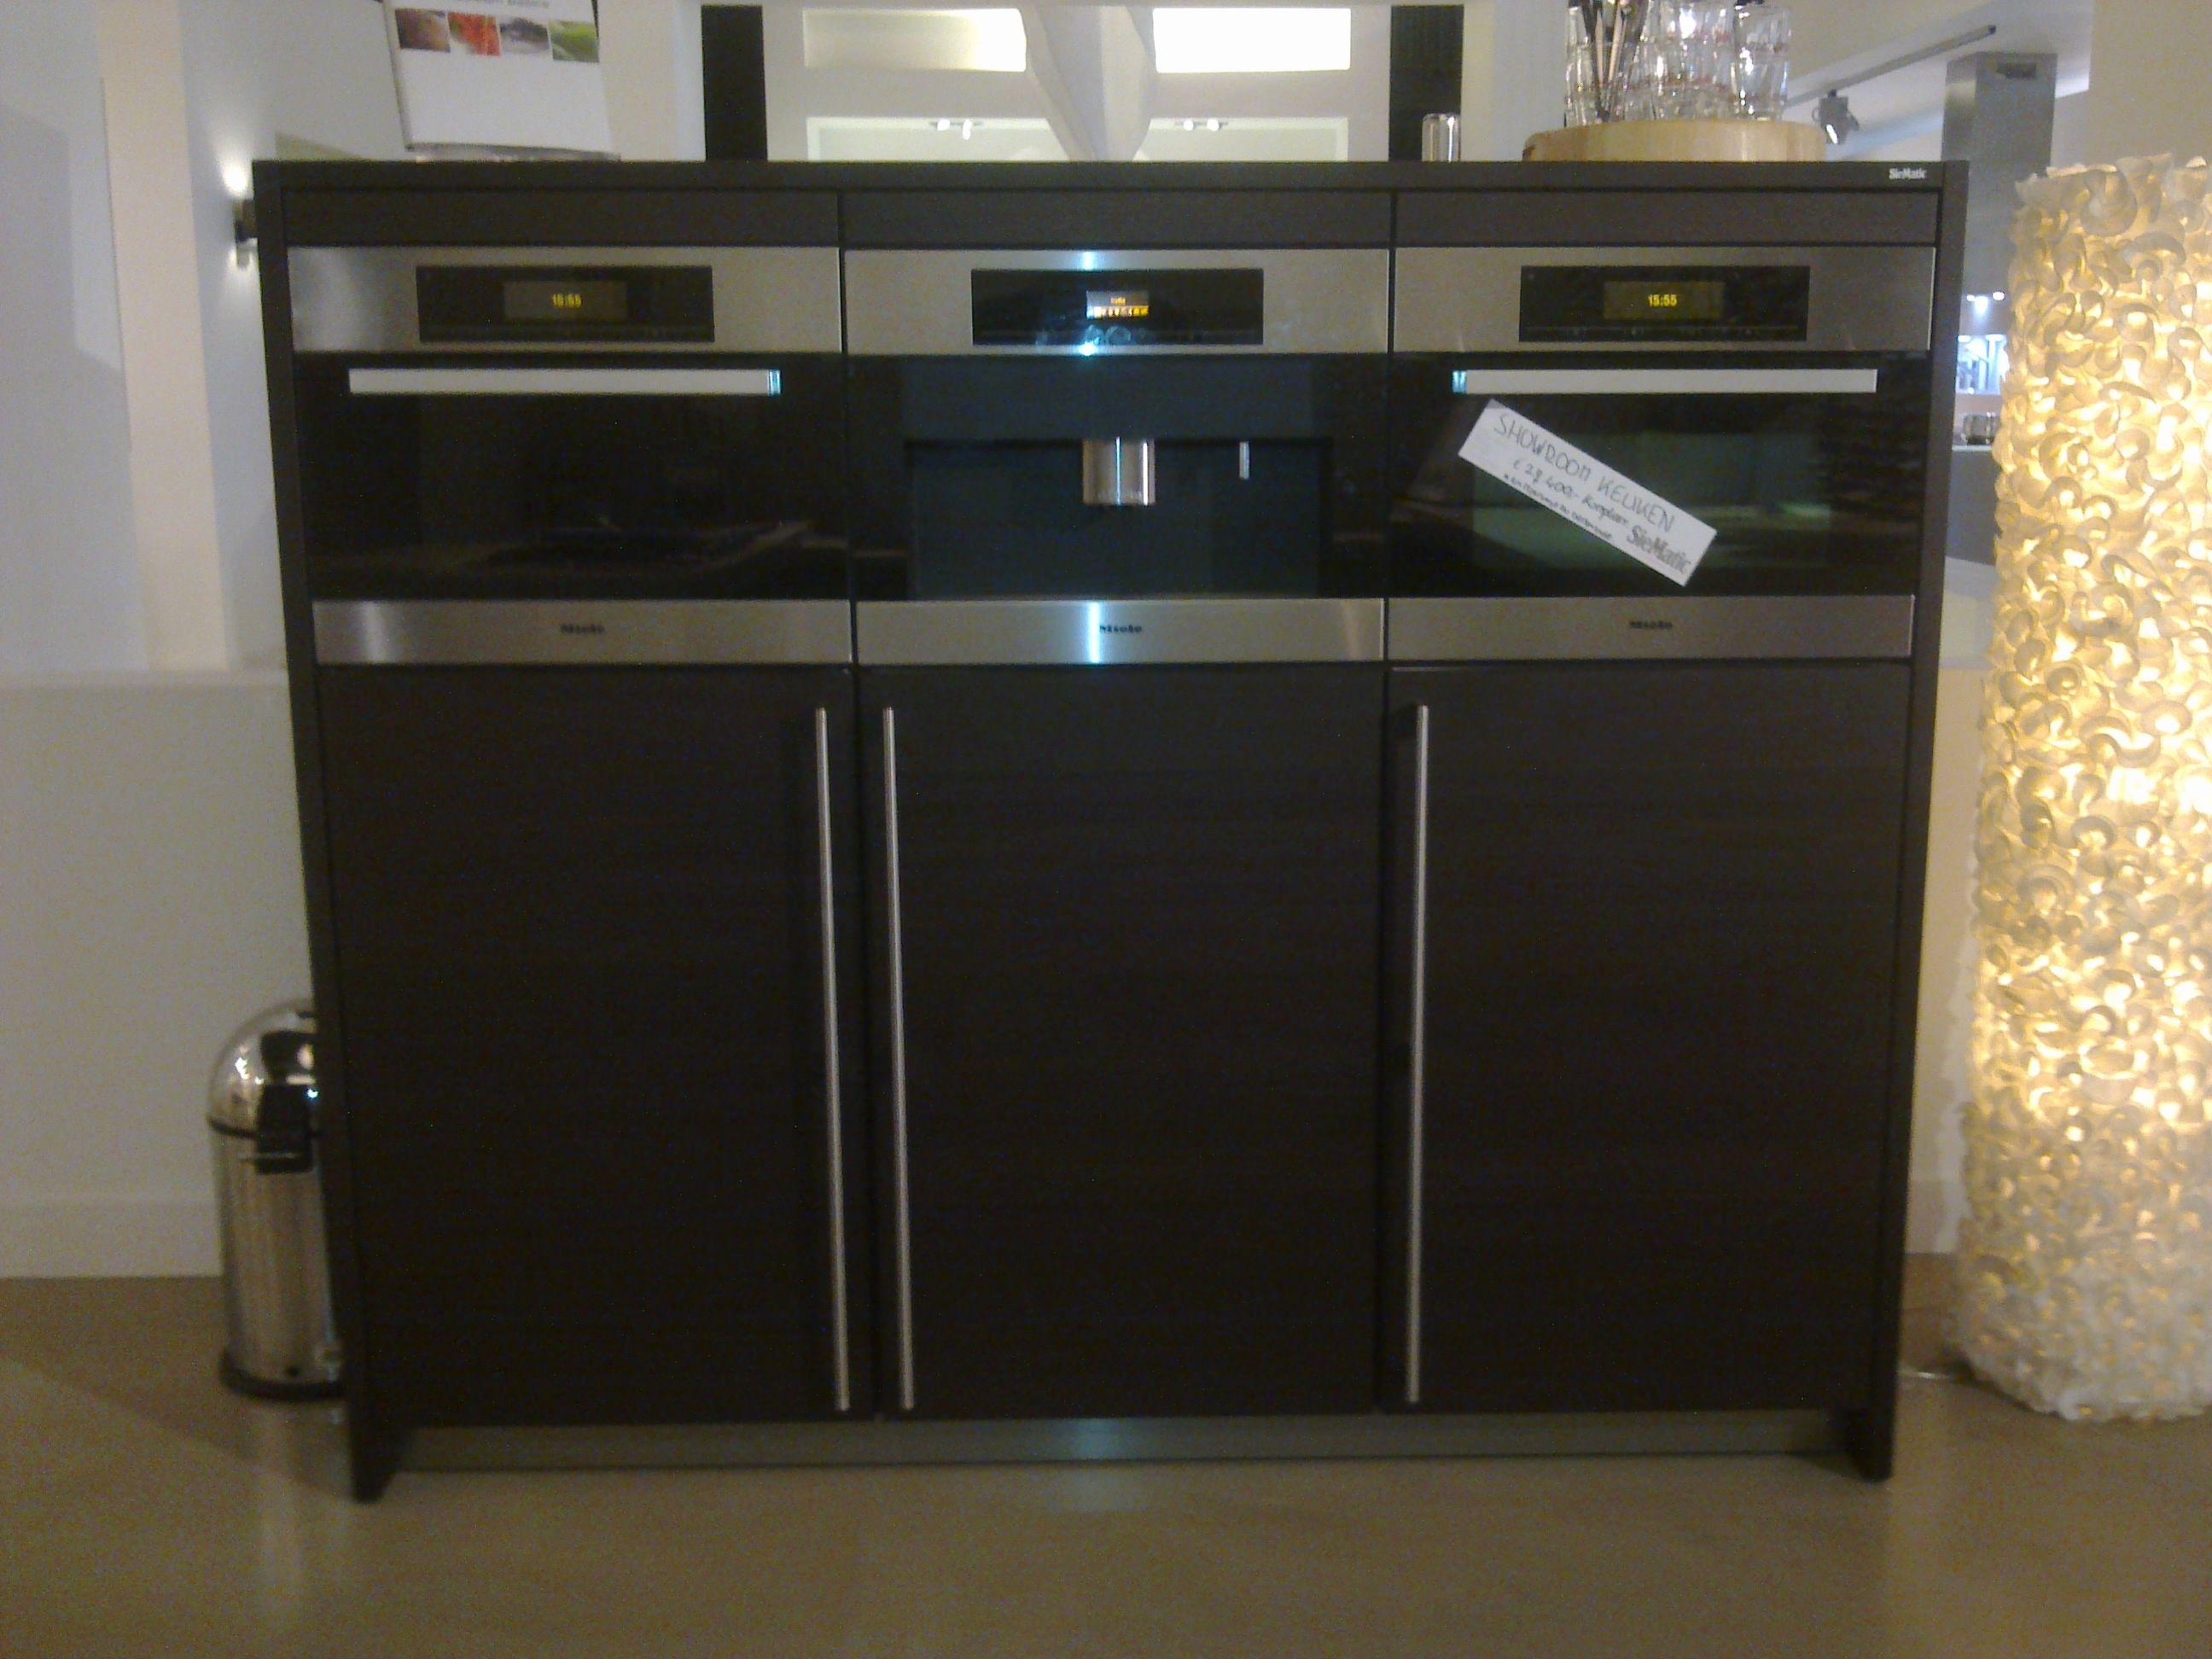 SieMatic SL 505 - SE 4004 P gefineerd